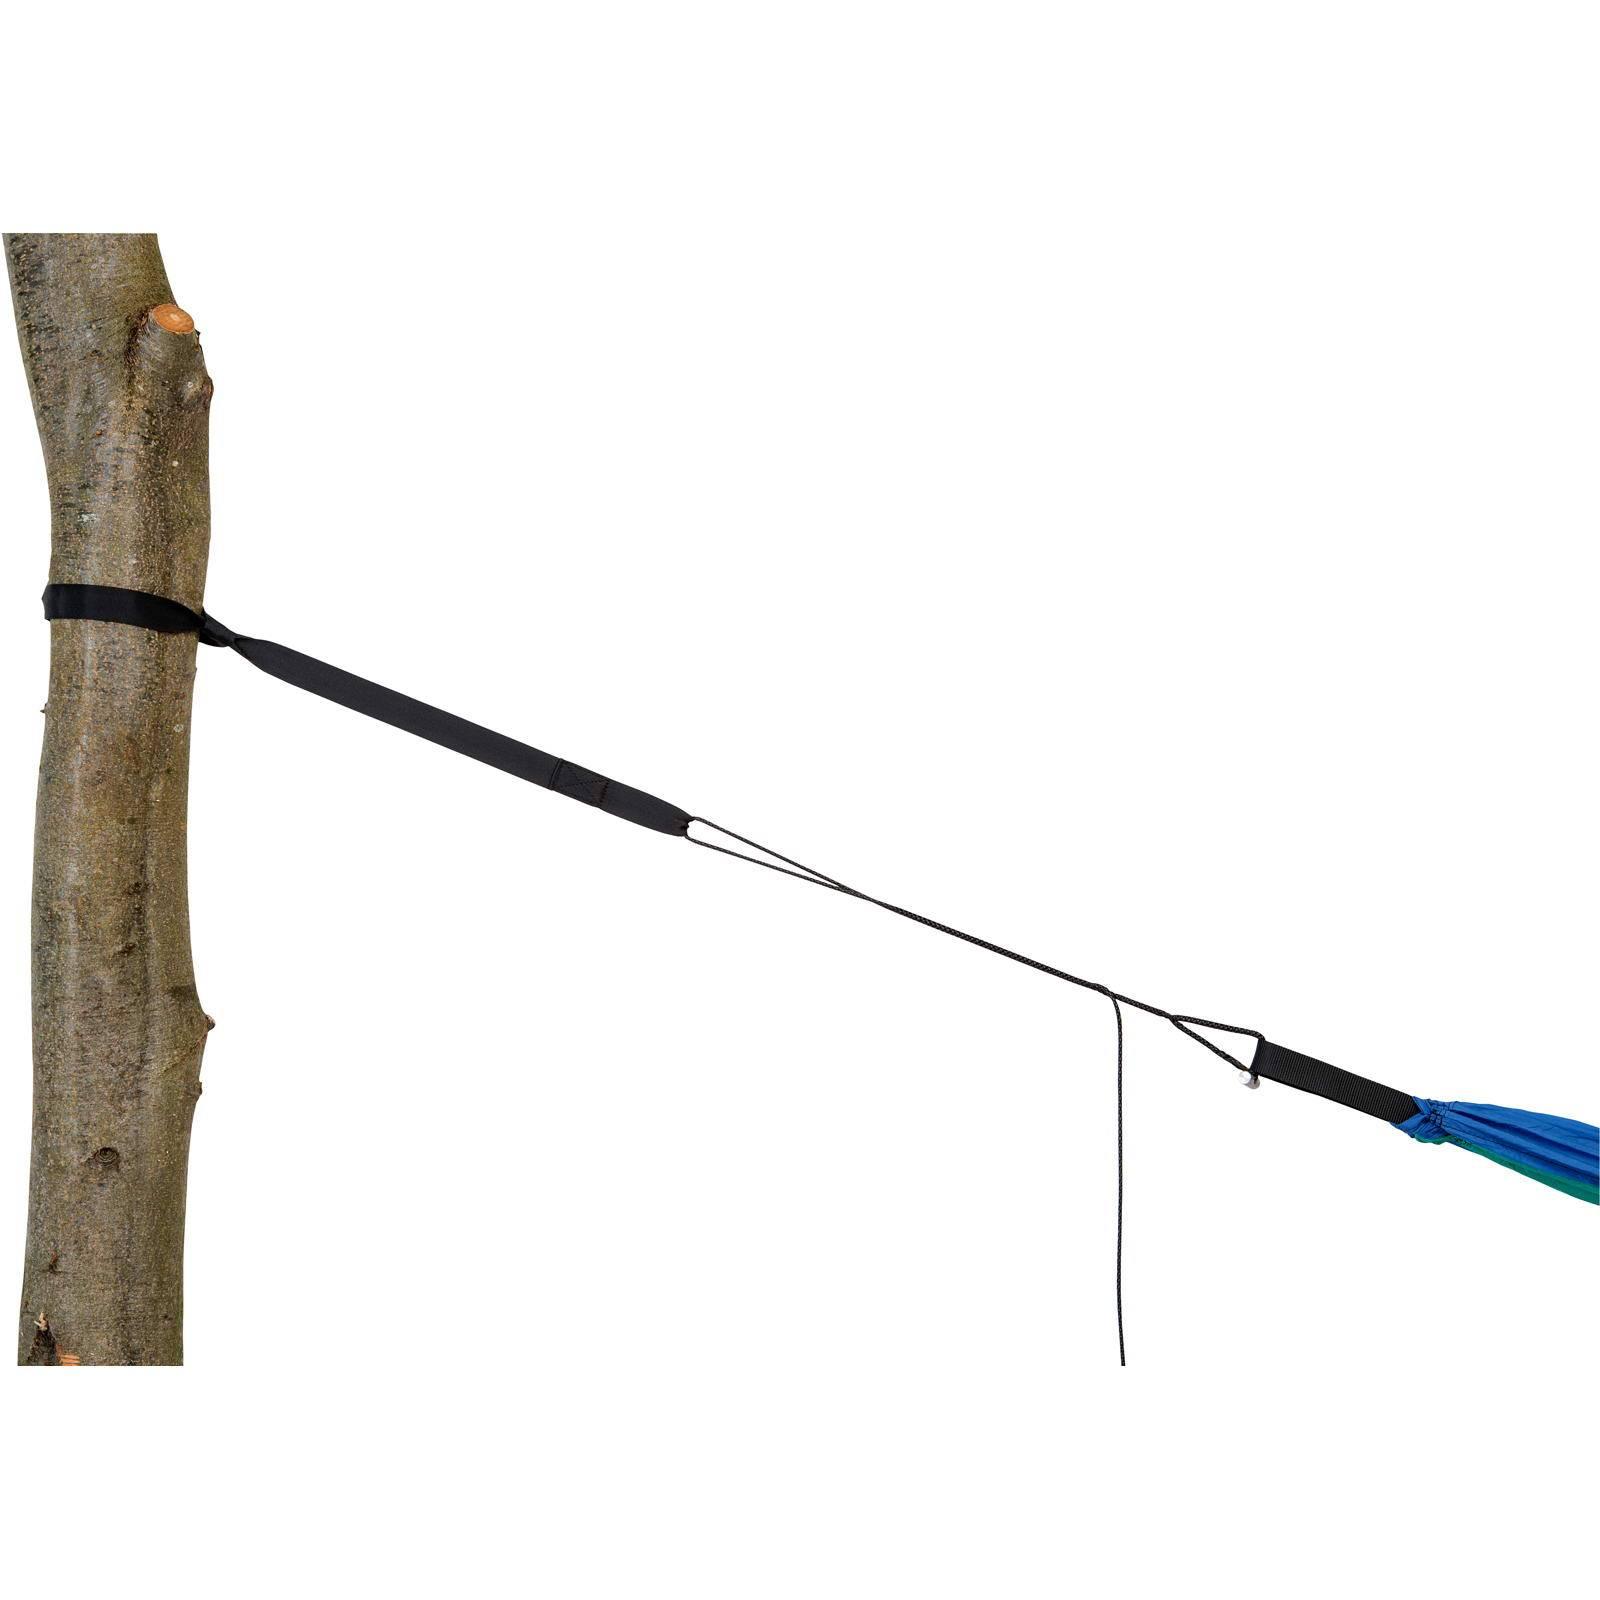 AMAZONAS Adventure-Rope - Hängemattenaufhängung - Bild 1